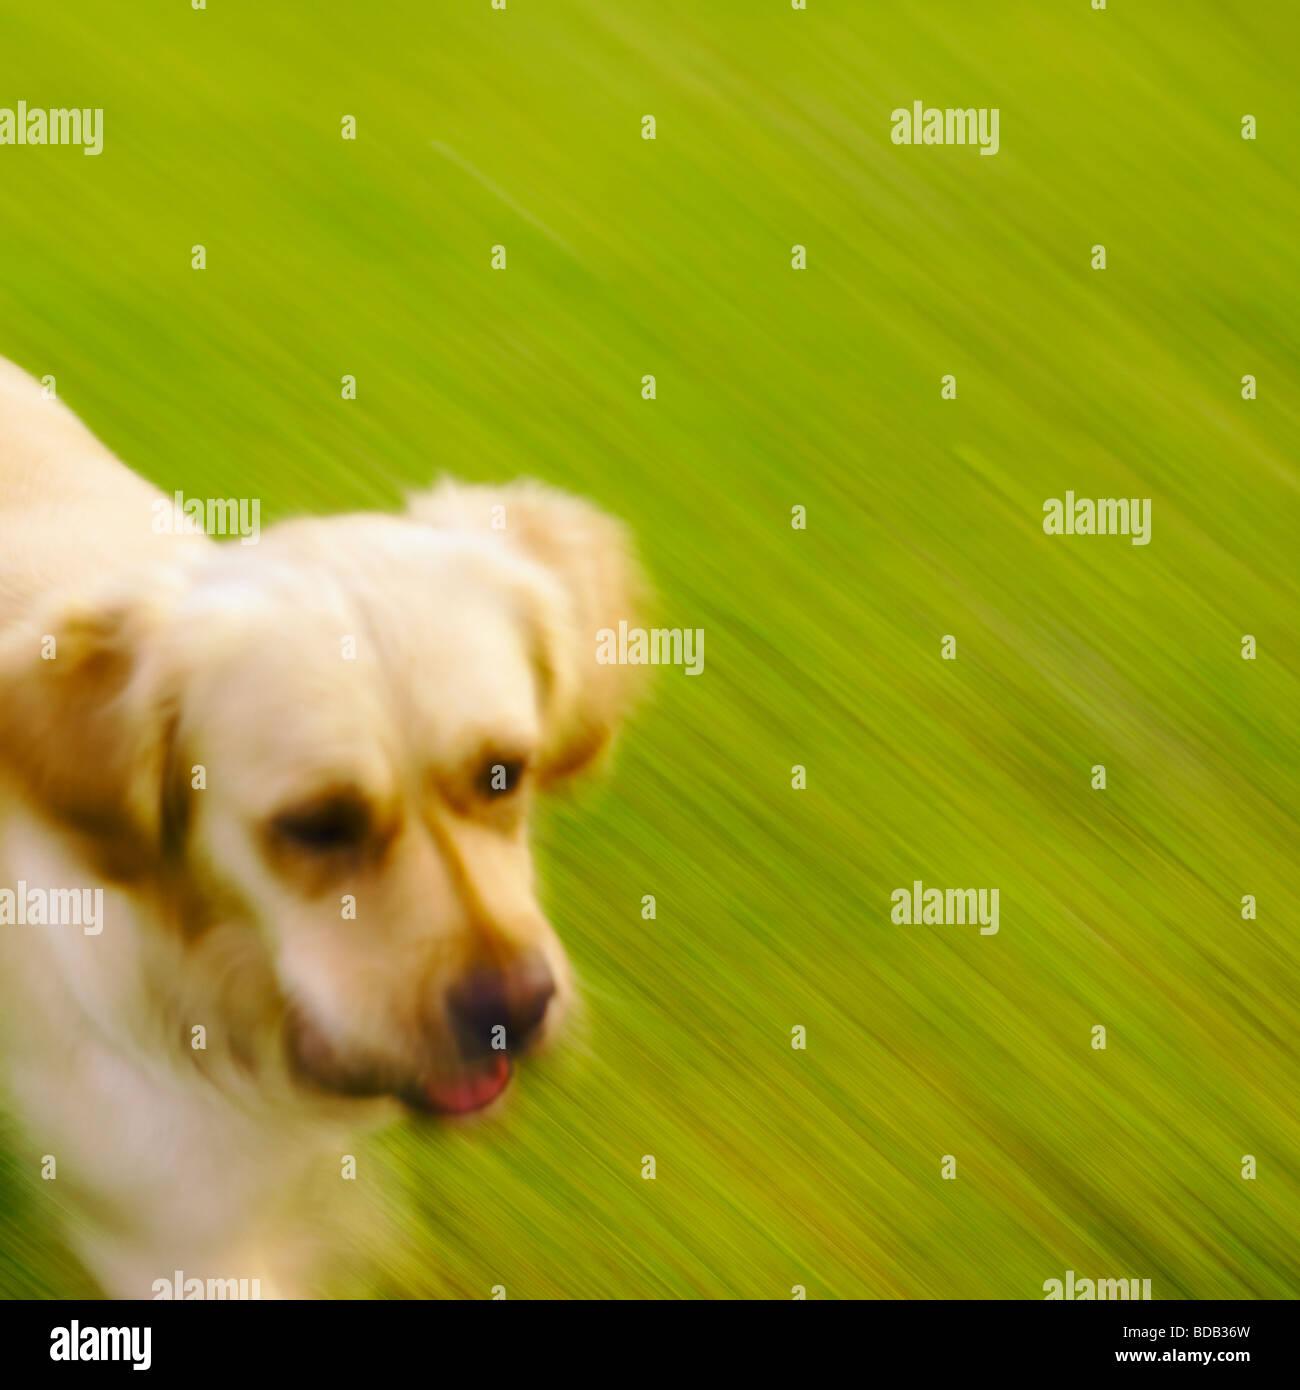 Golden Retriever Blurred Running On Grass. - Stock Image